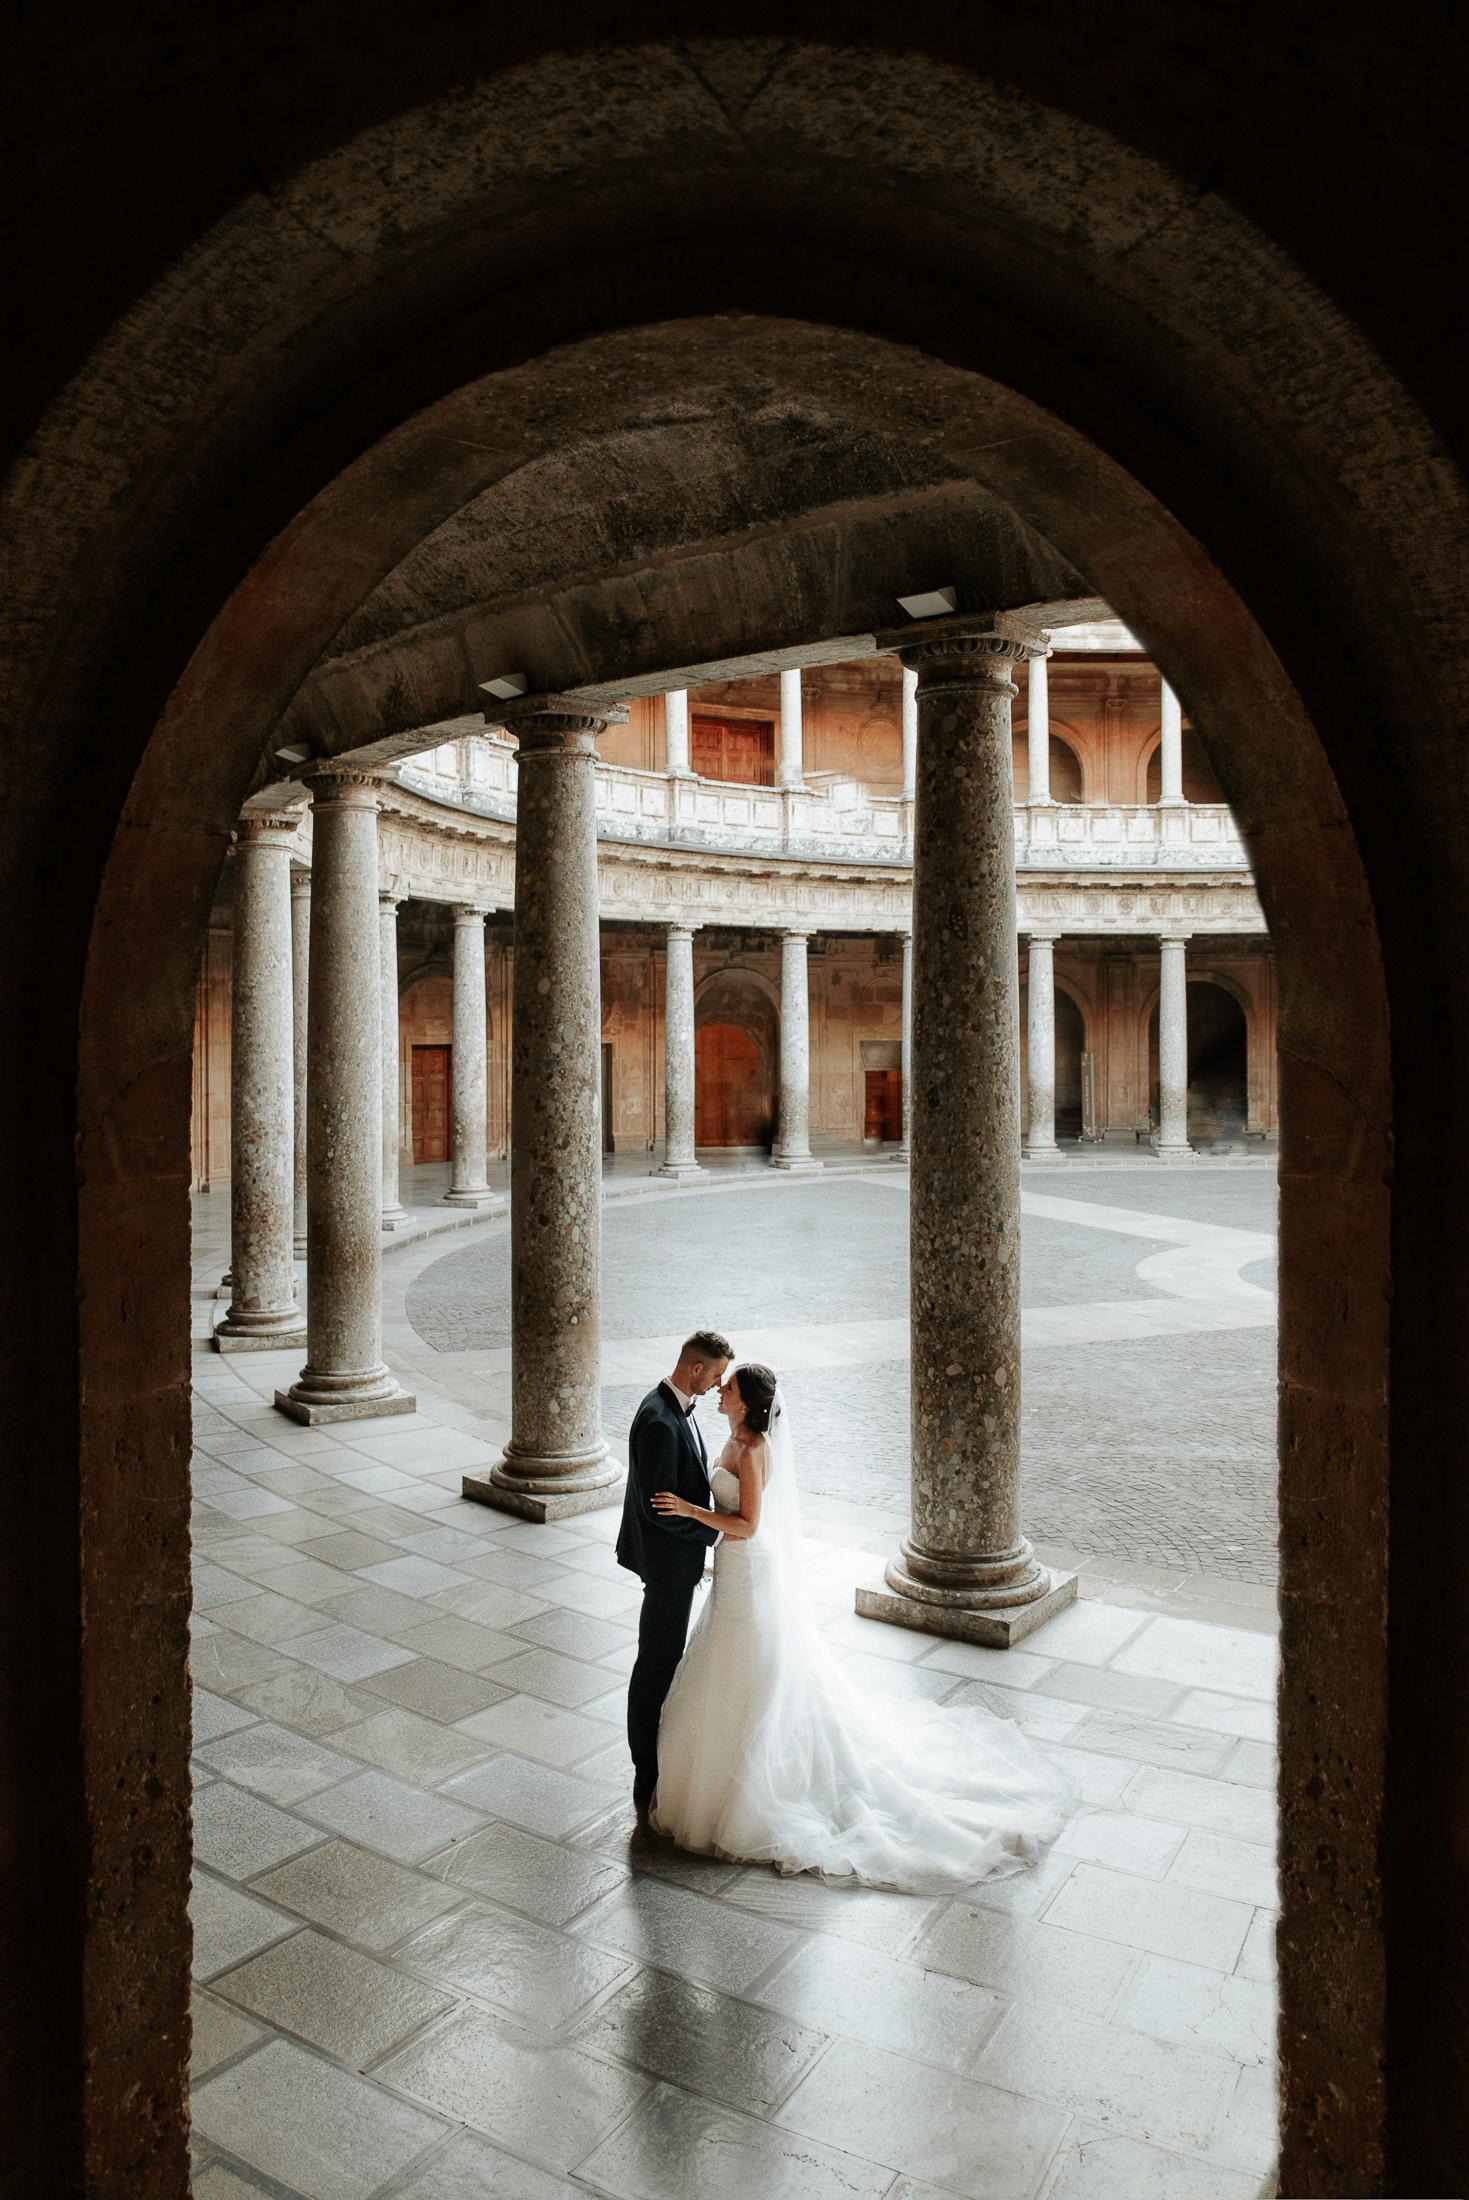 Novia en Alhambra. Post boda en Alhambra